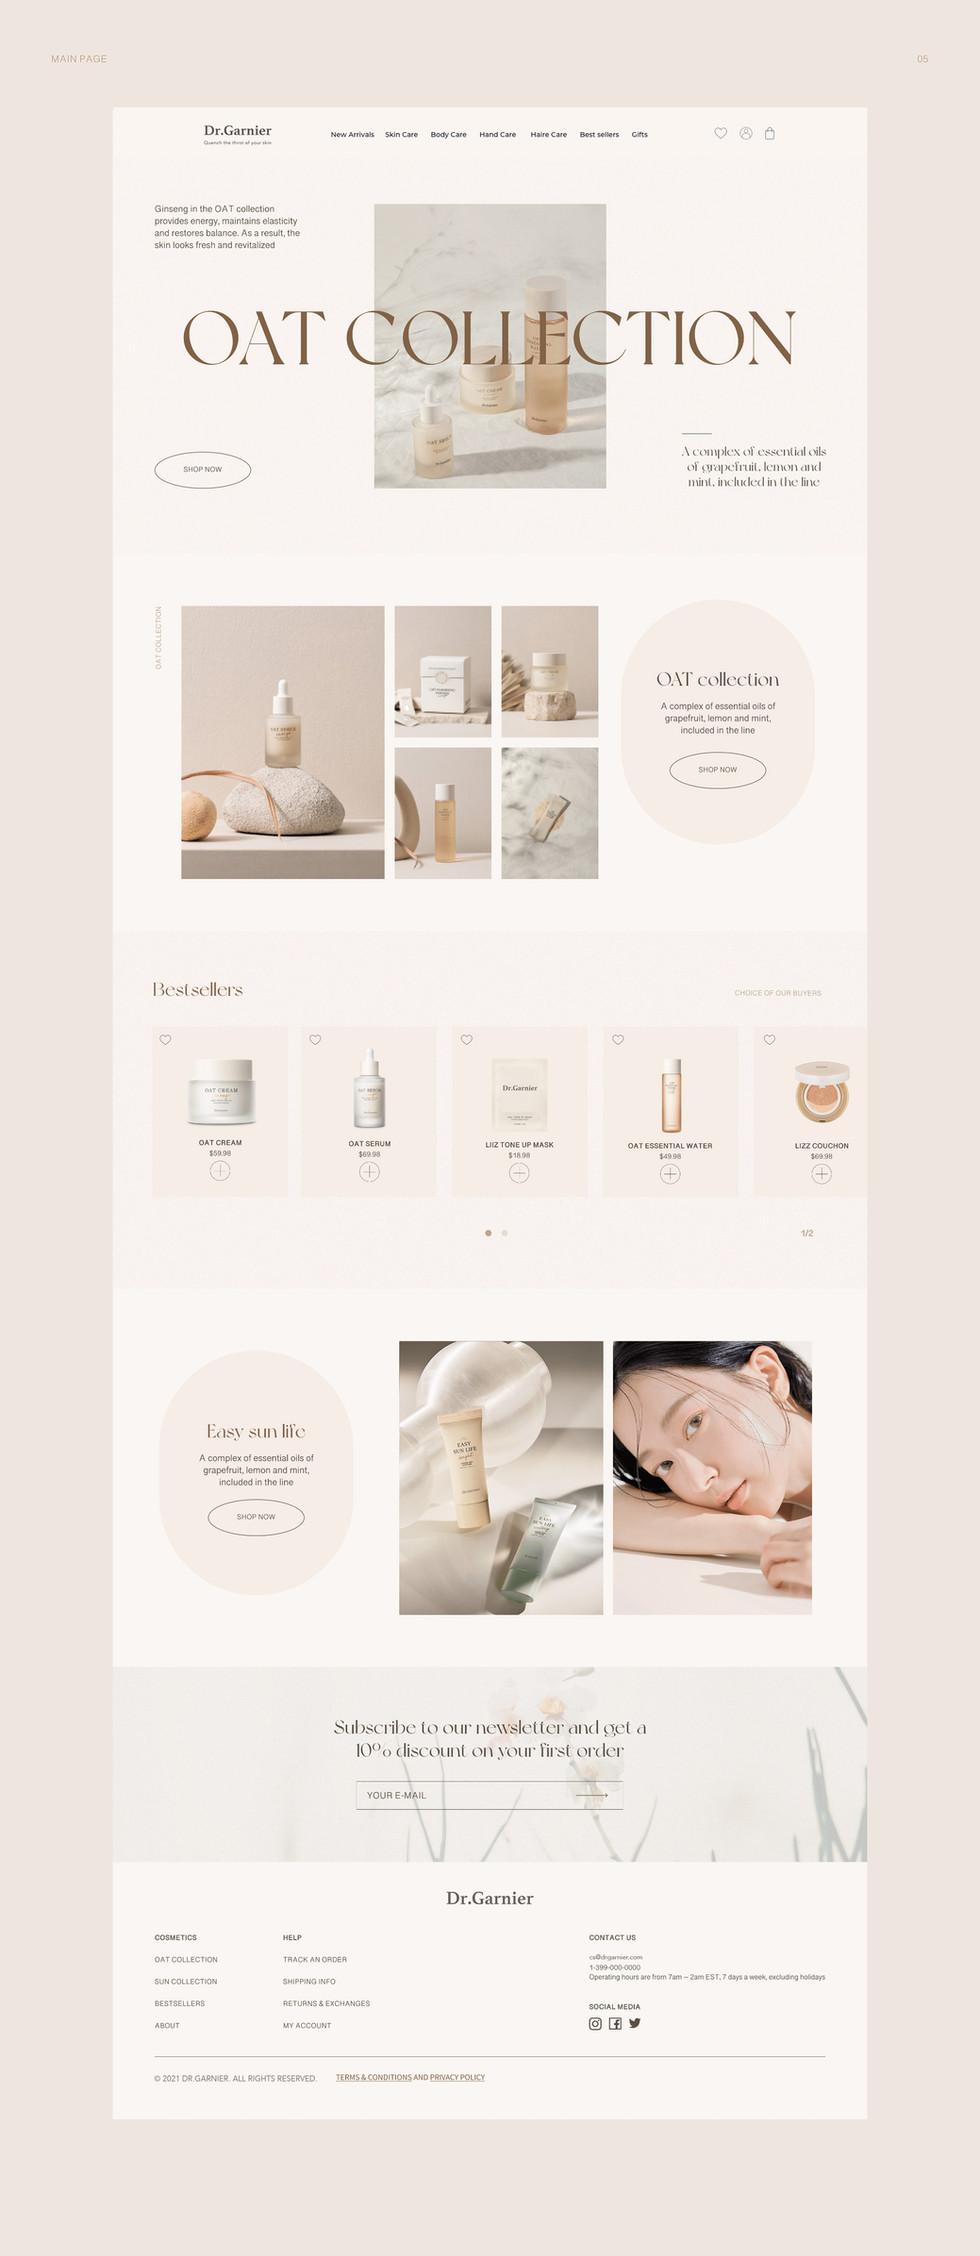 DR. Garnier Cosmetic Website Design5.jpg